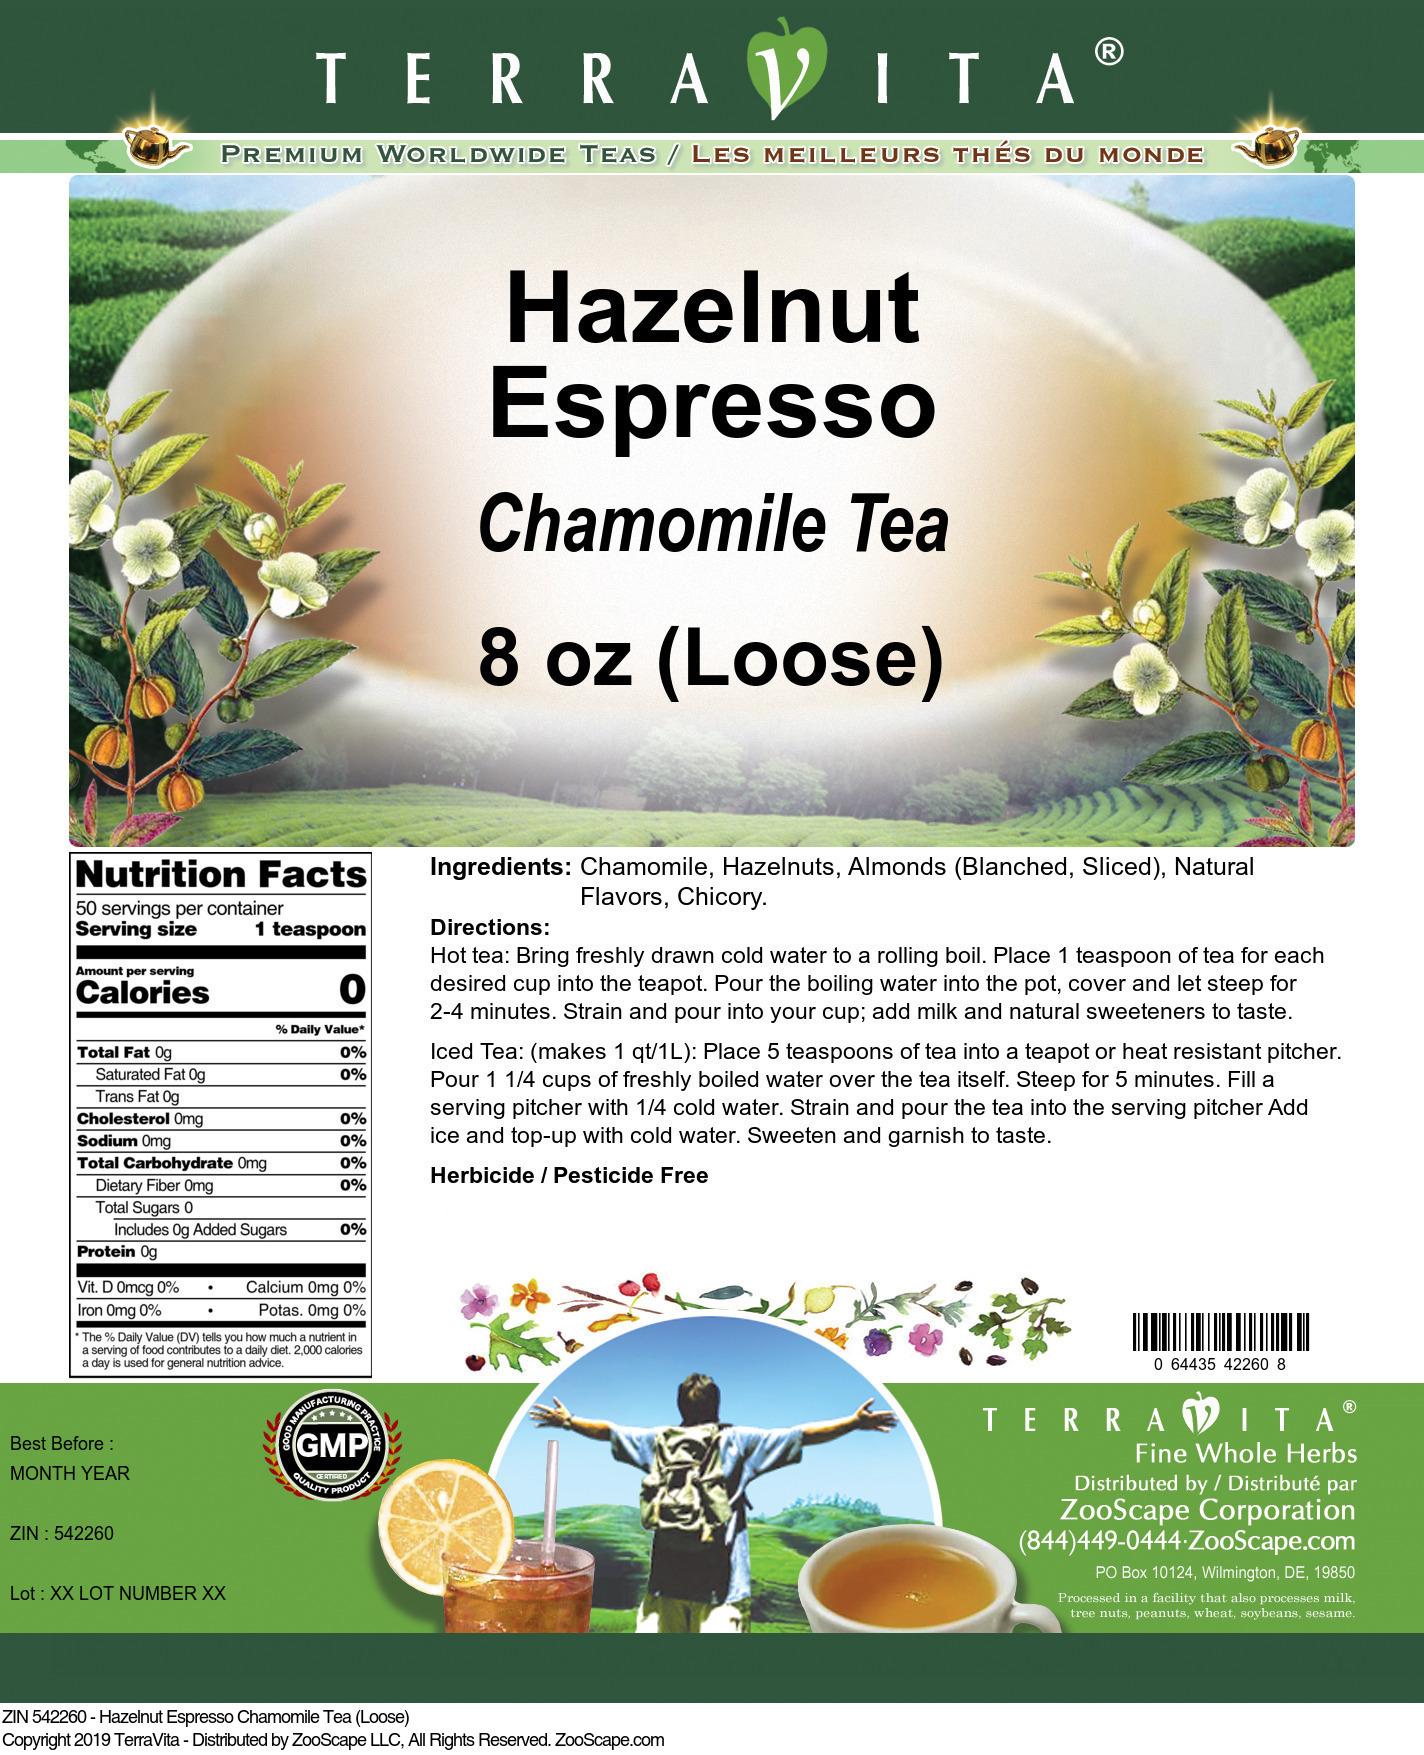 Hazelnut Espresso Chamomile Tea (Loose)